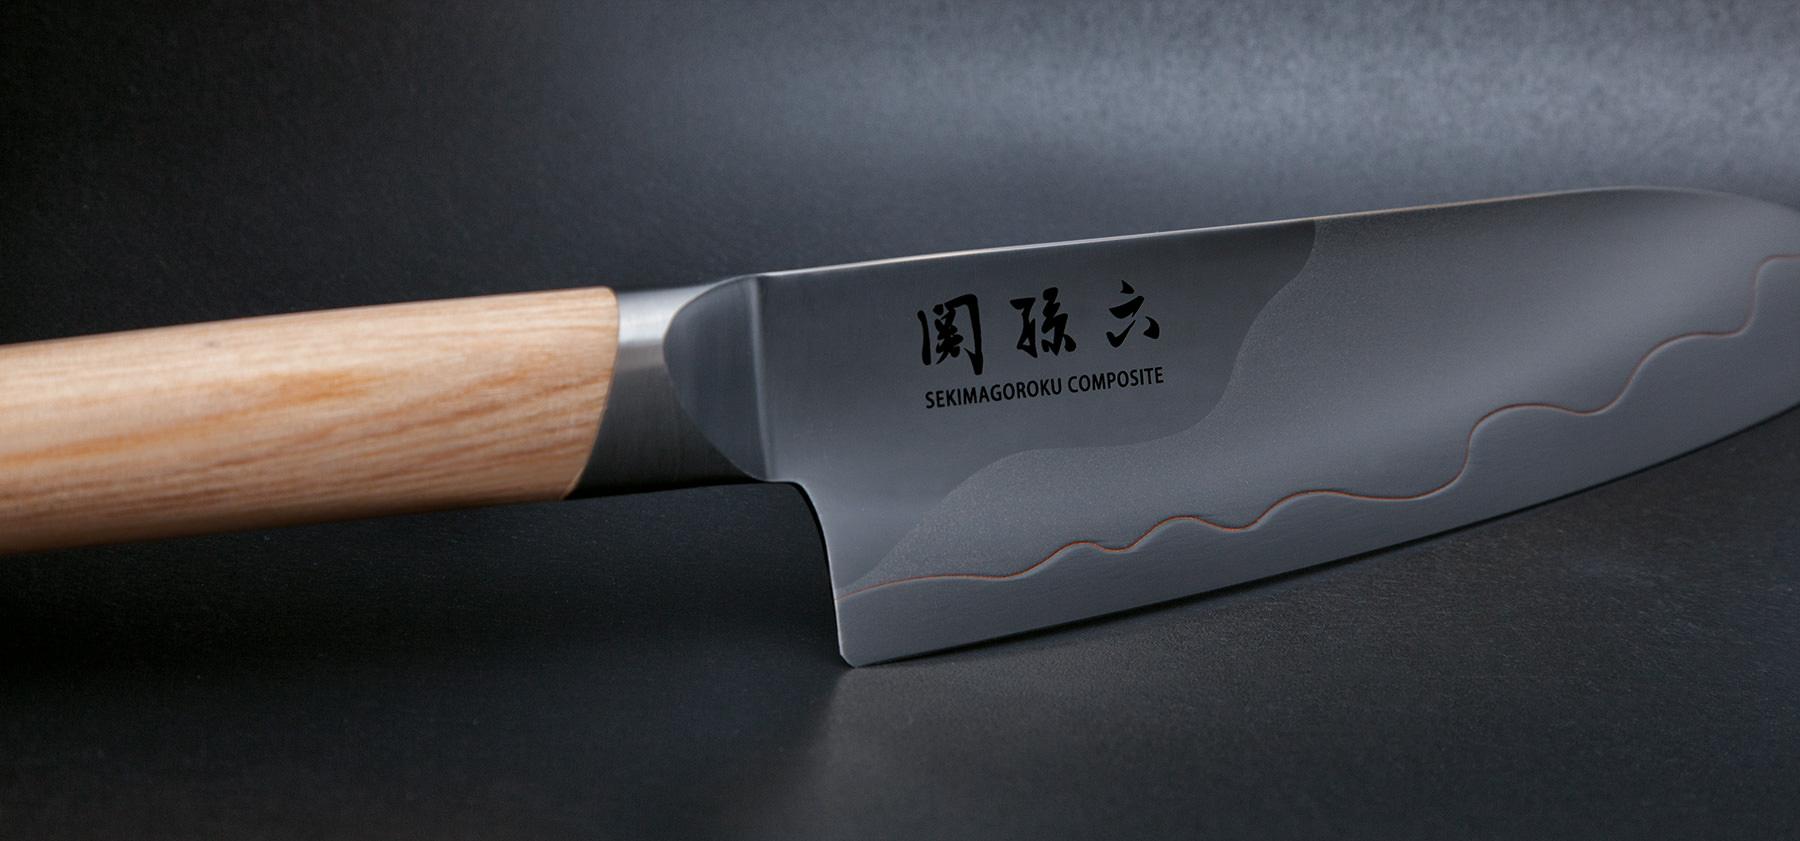 SEKI MAGOROKU COMPOSITE